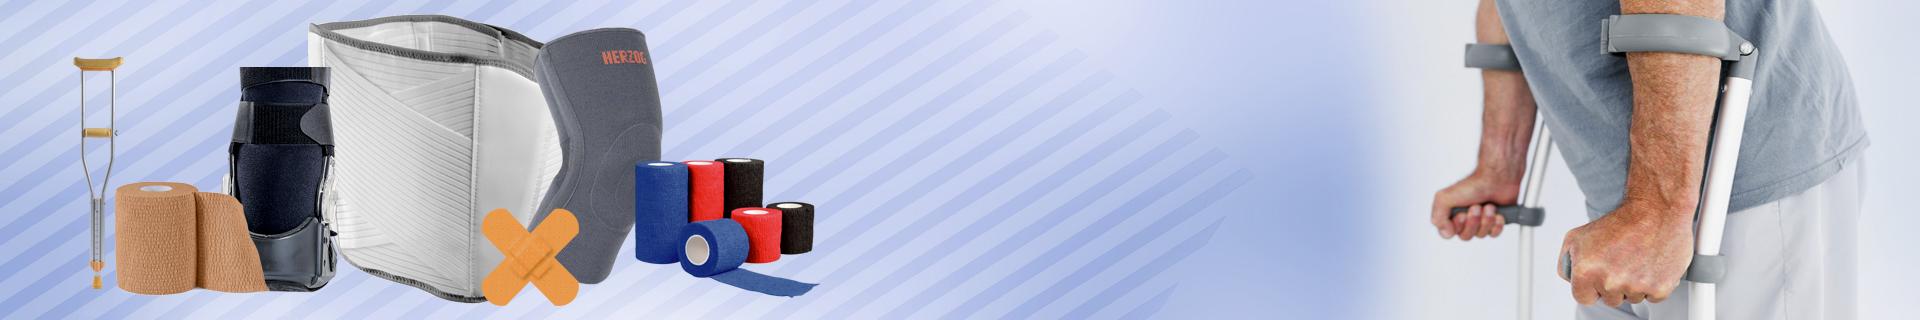 ▷ Classement   Comparatif  Top ceintures lombaires En Févr. 2019 4fbf2d4f7f2